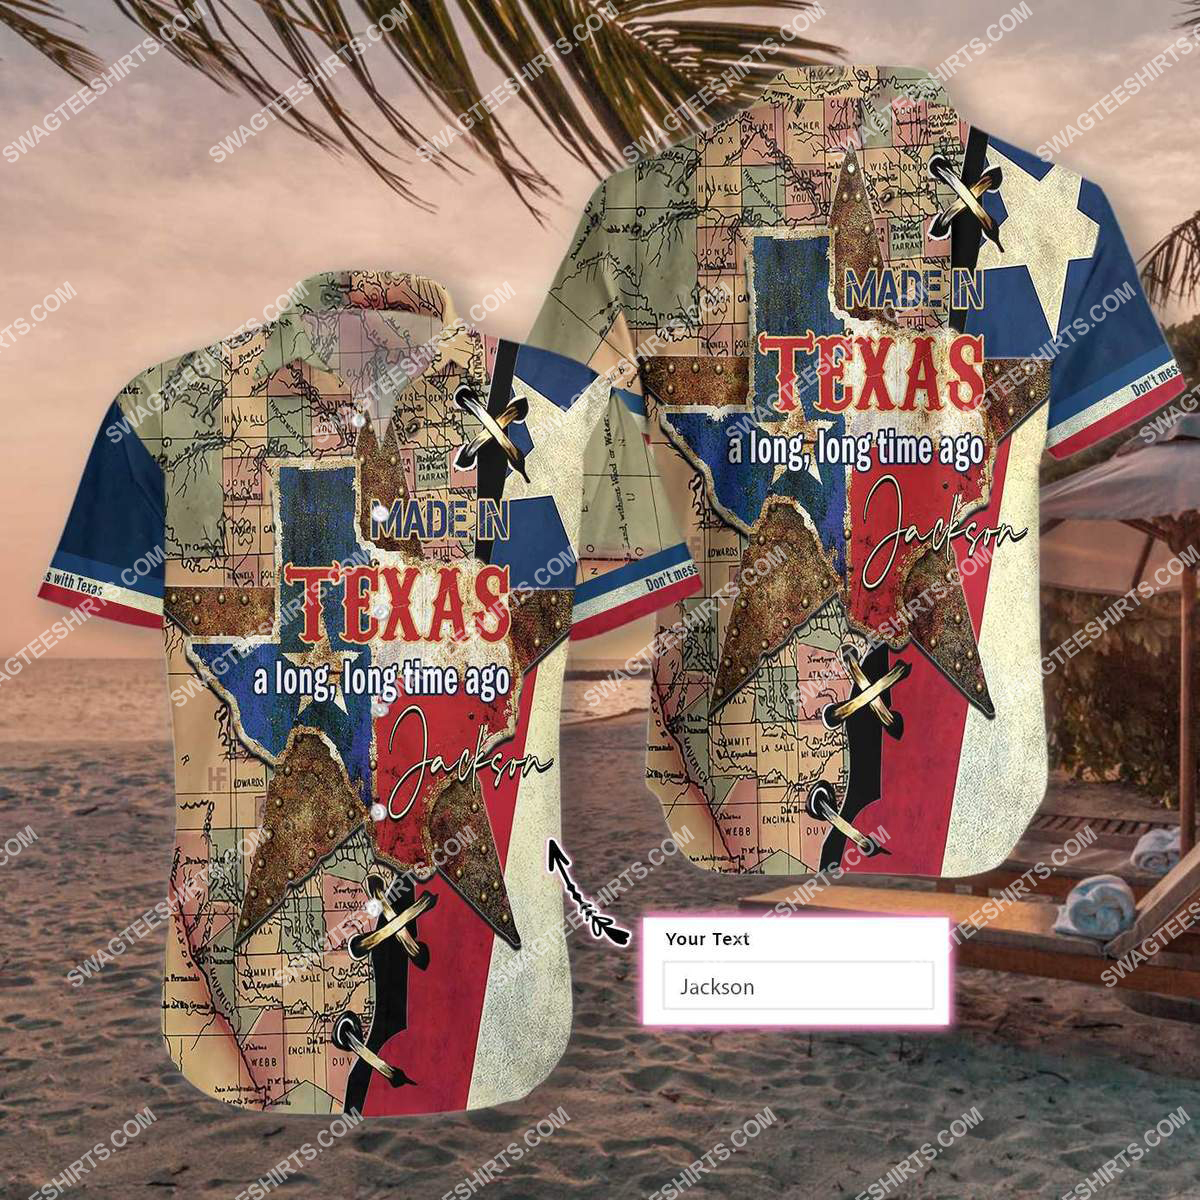 custom name made in texas a long long time ago all over printed hawaiian shirt 2(1) - Copy